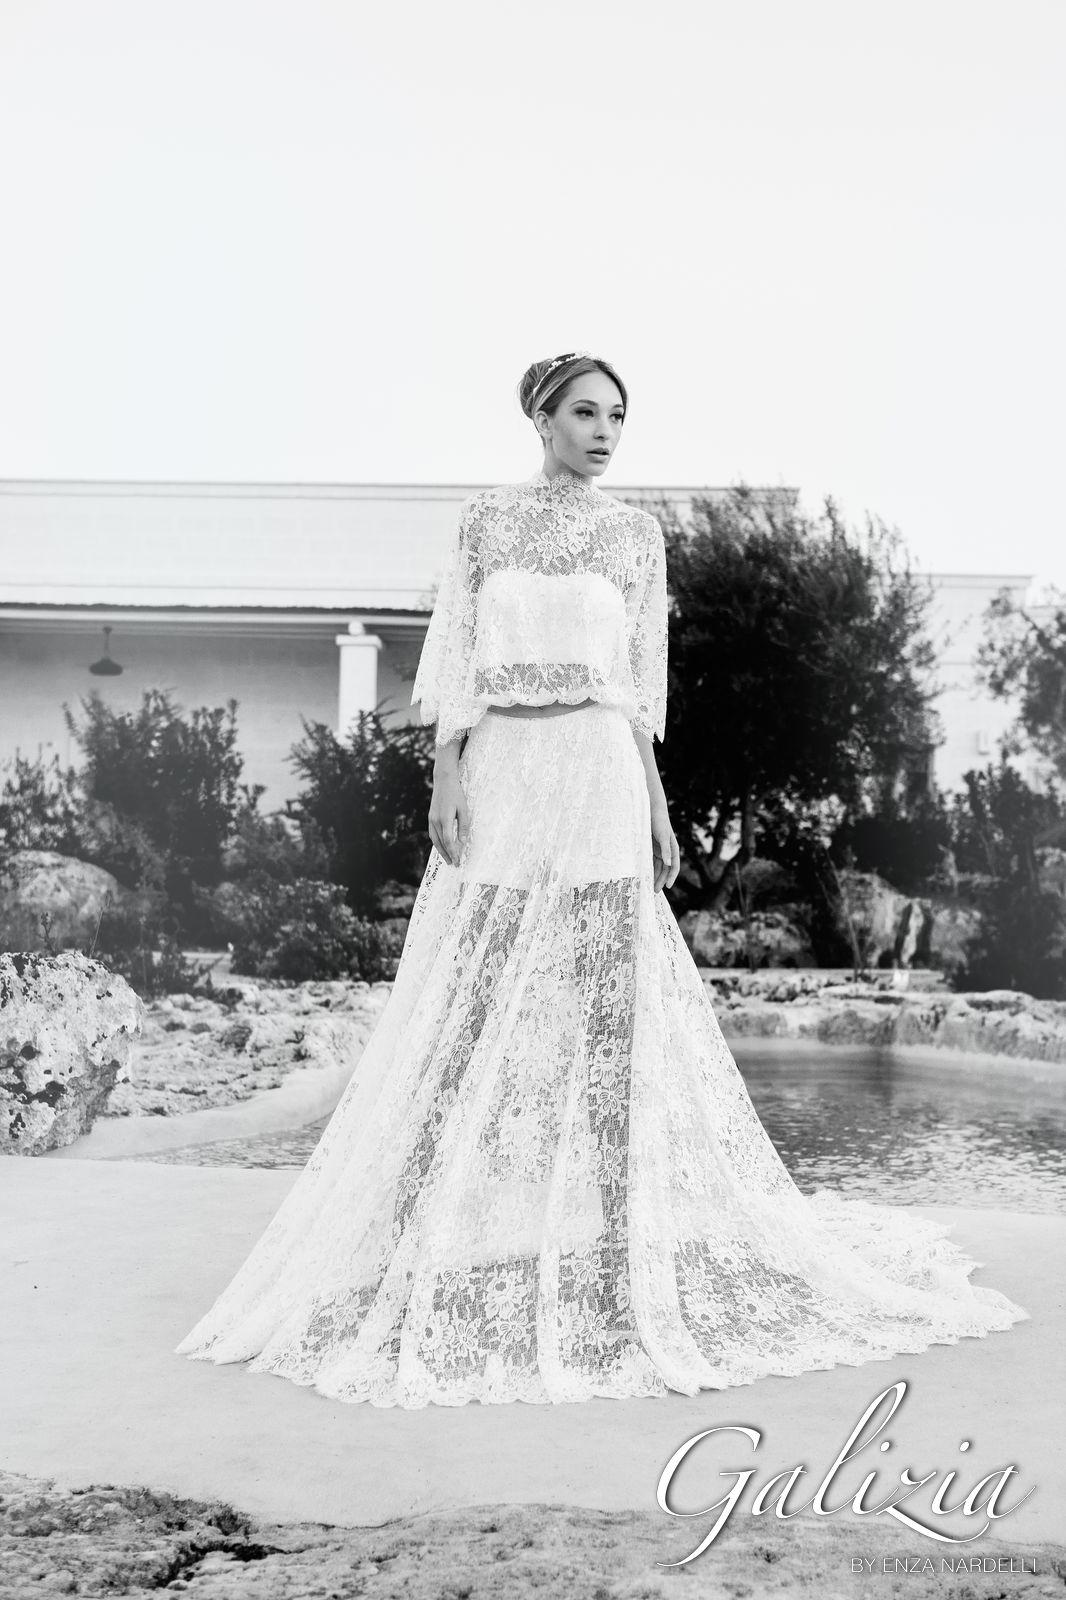 Jenna galizia wedding